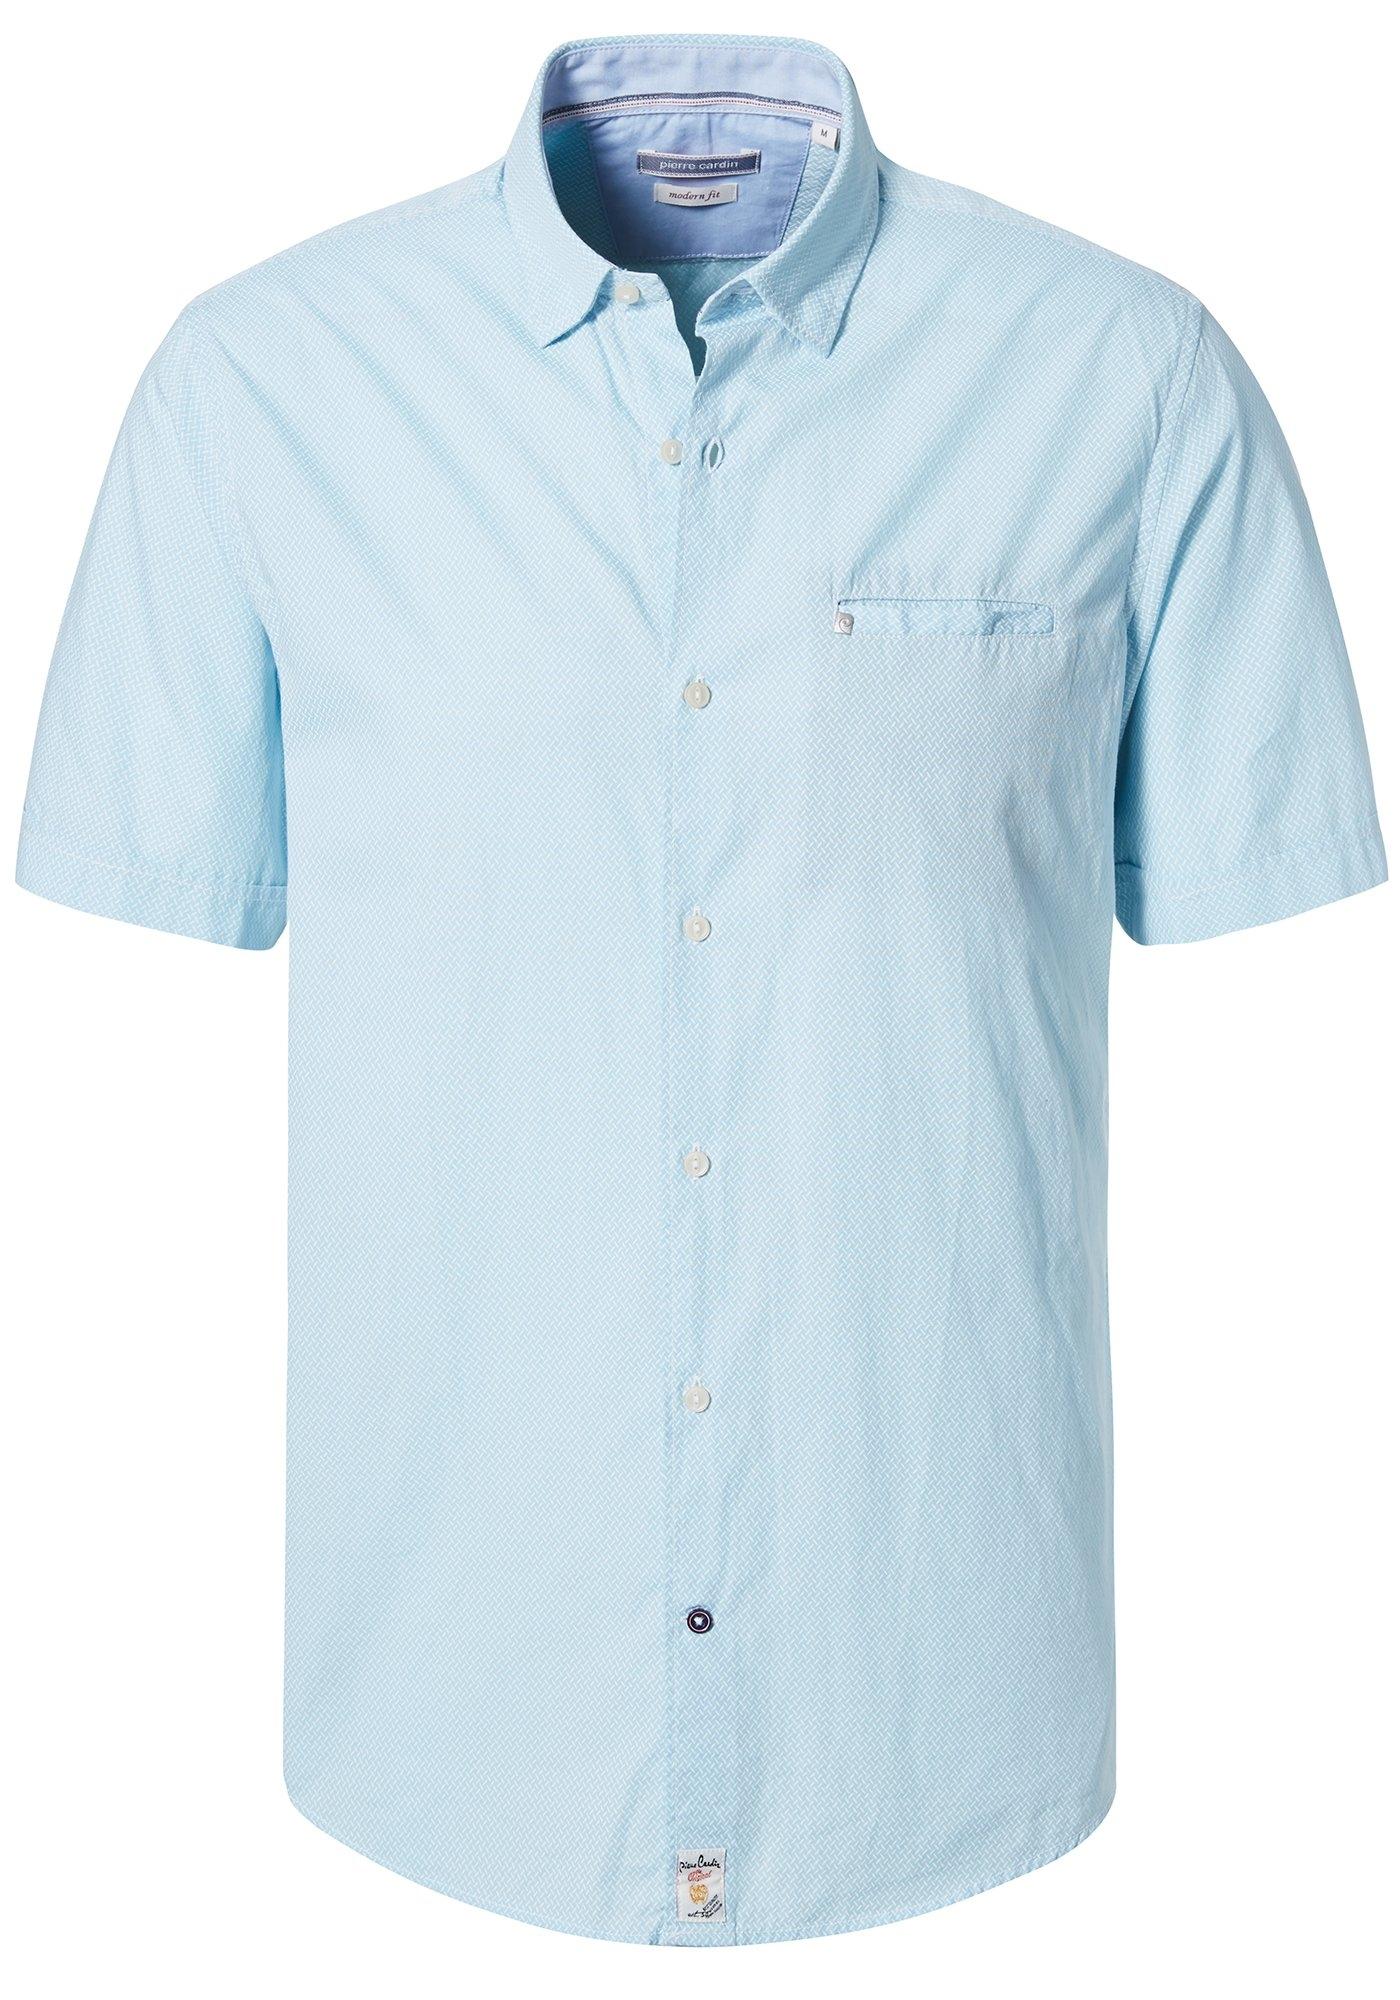 Pierre Cardin Overhemd met minimale print - modern fit - gratis ruilen op otto.nl